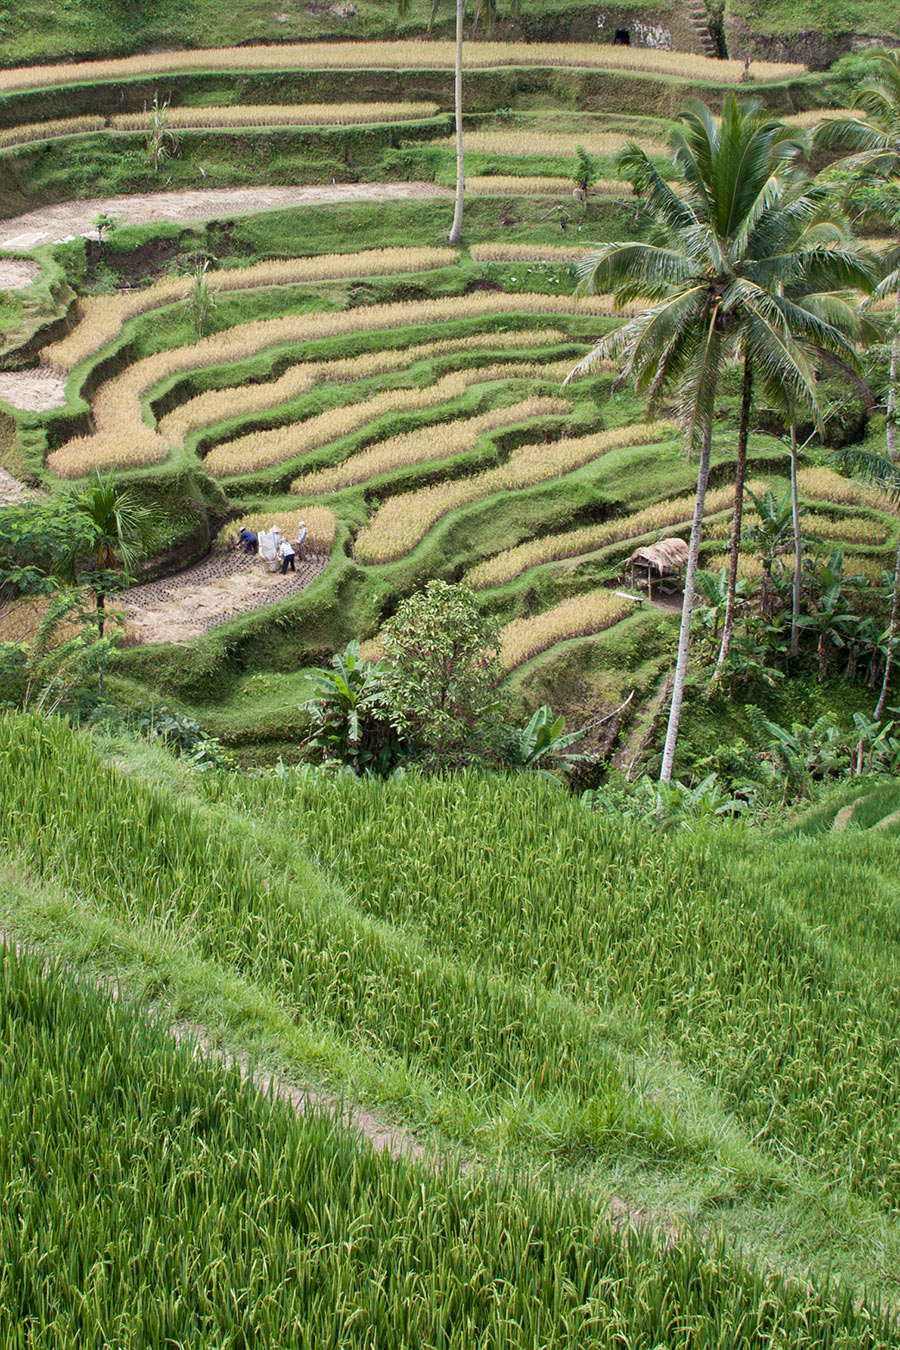 Terraced rice paddies in Bali.